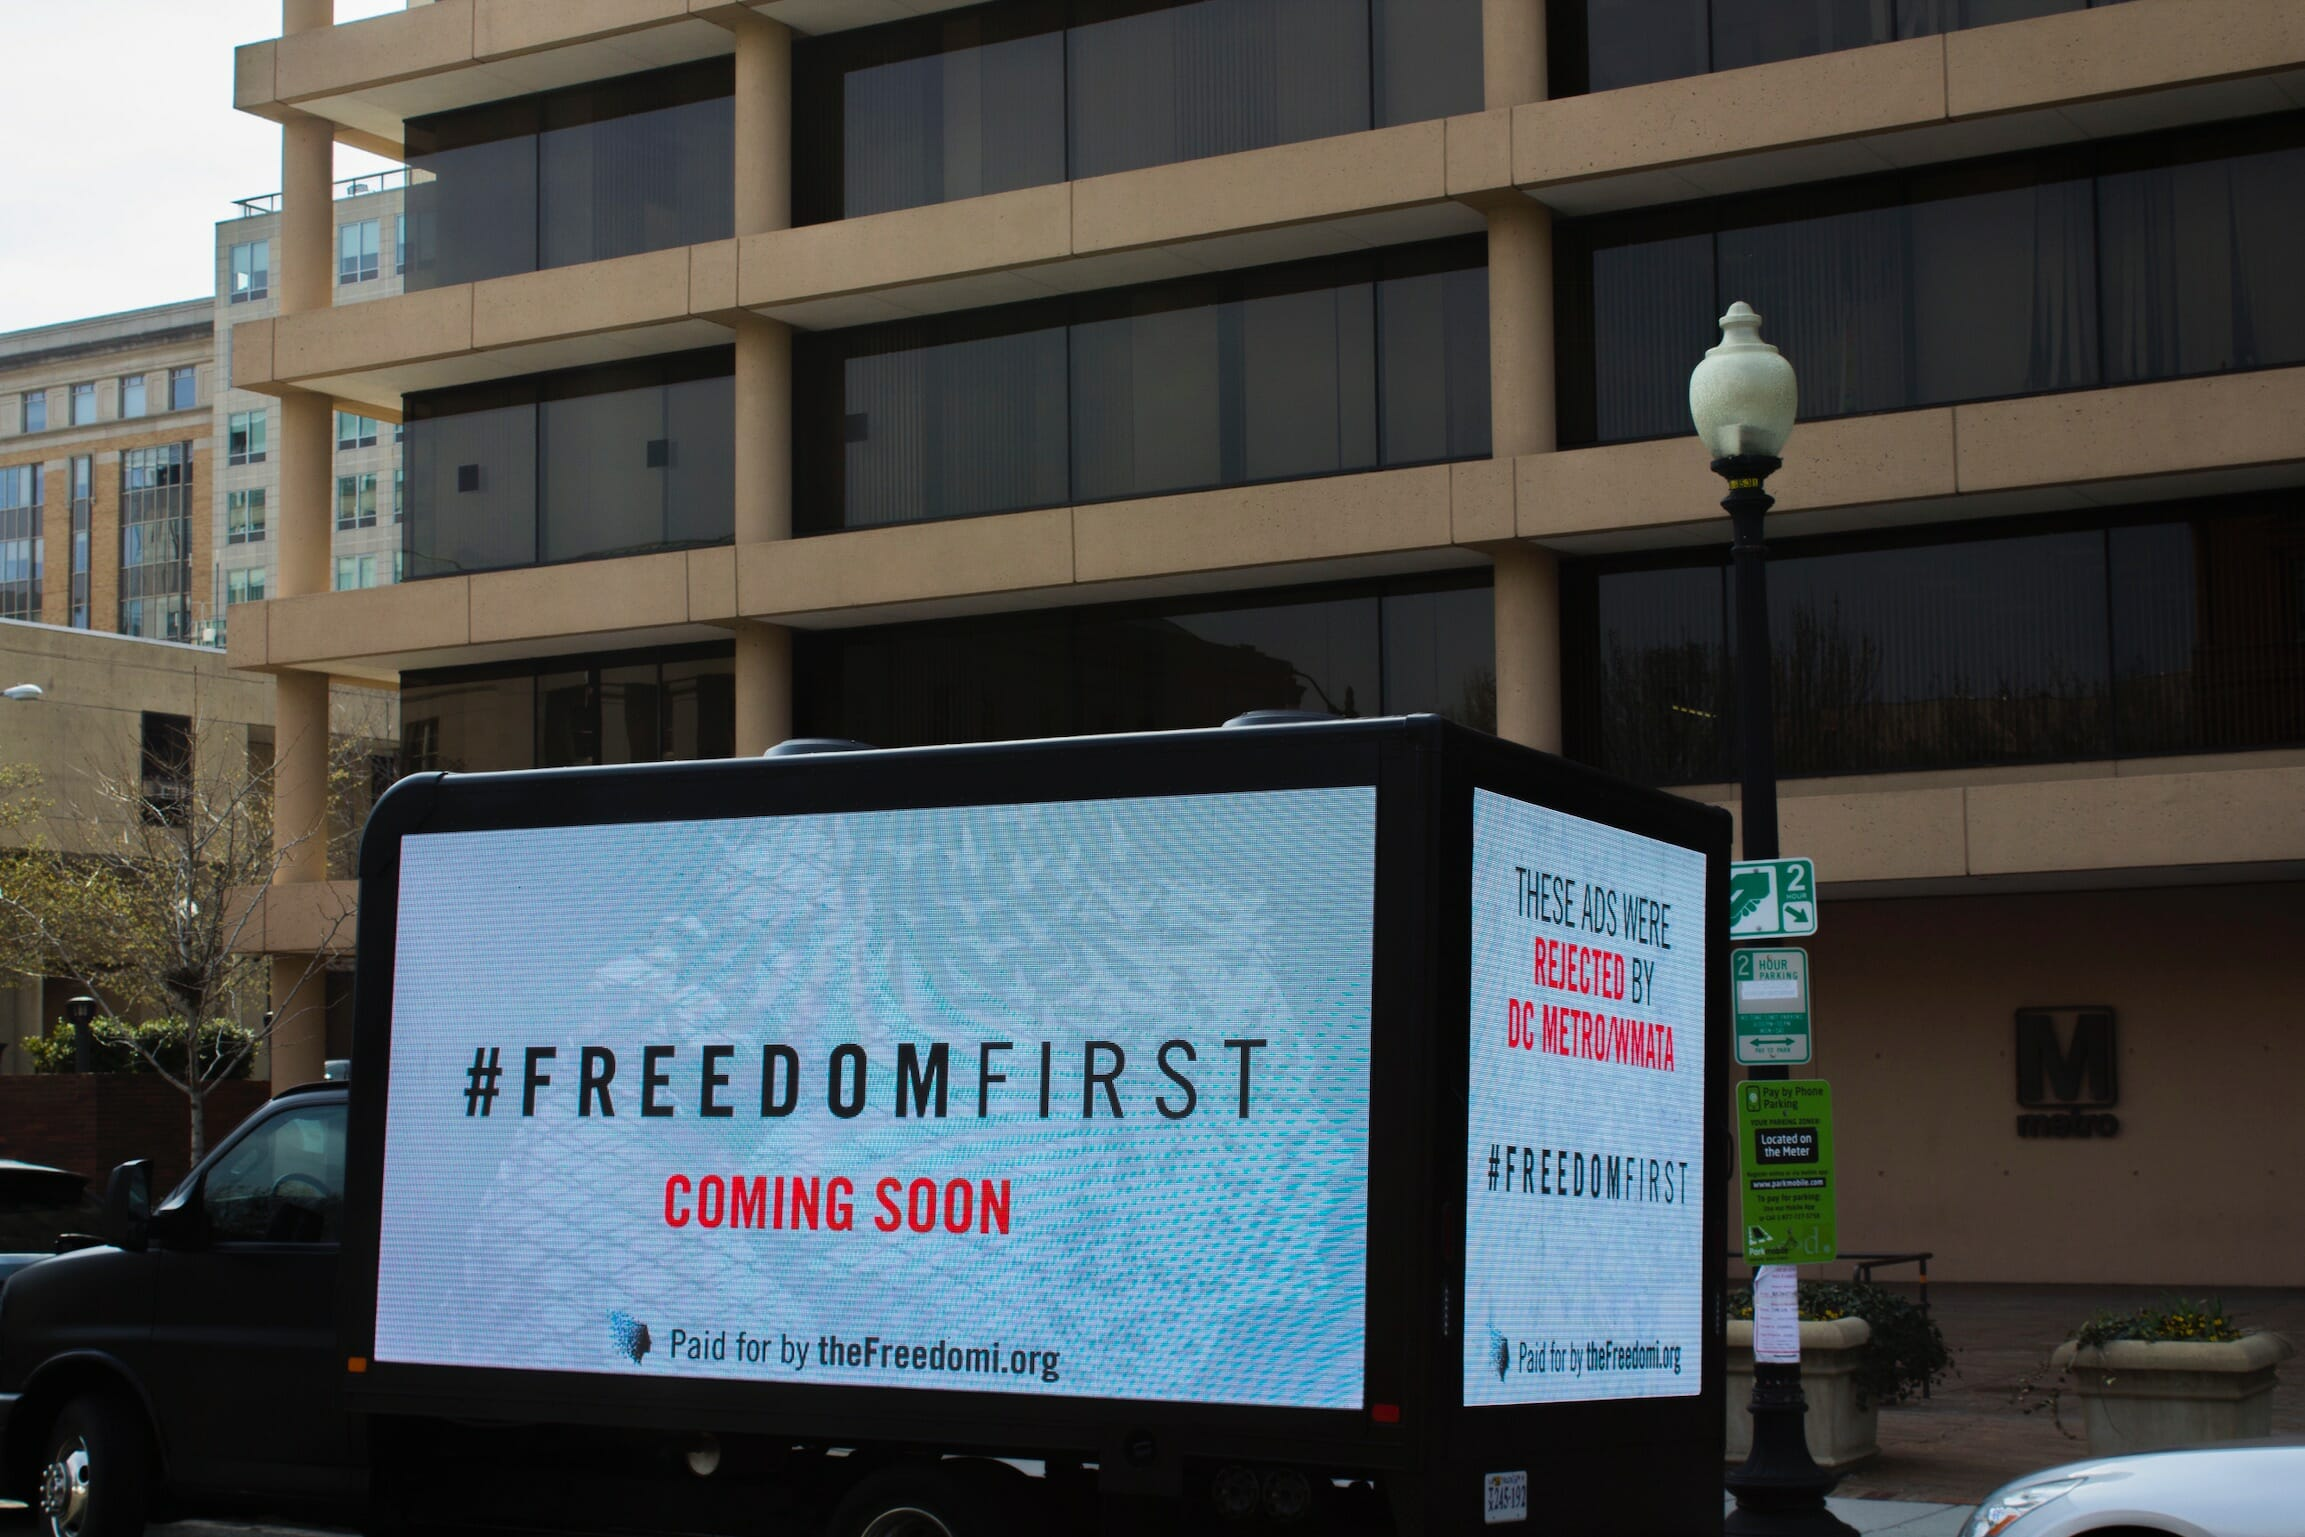 #FreedomFirst